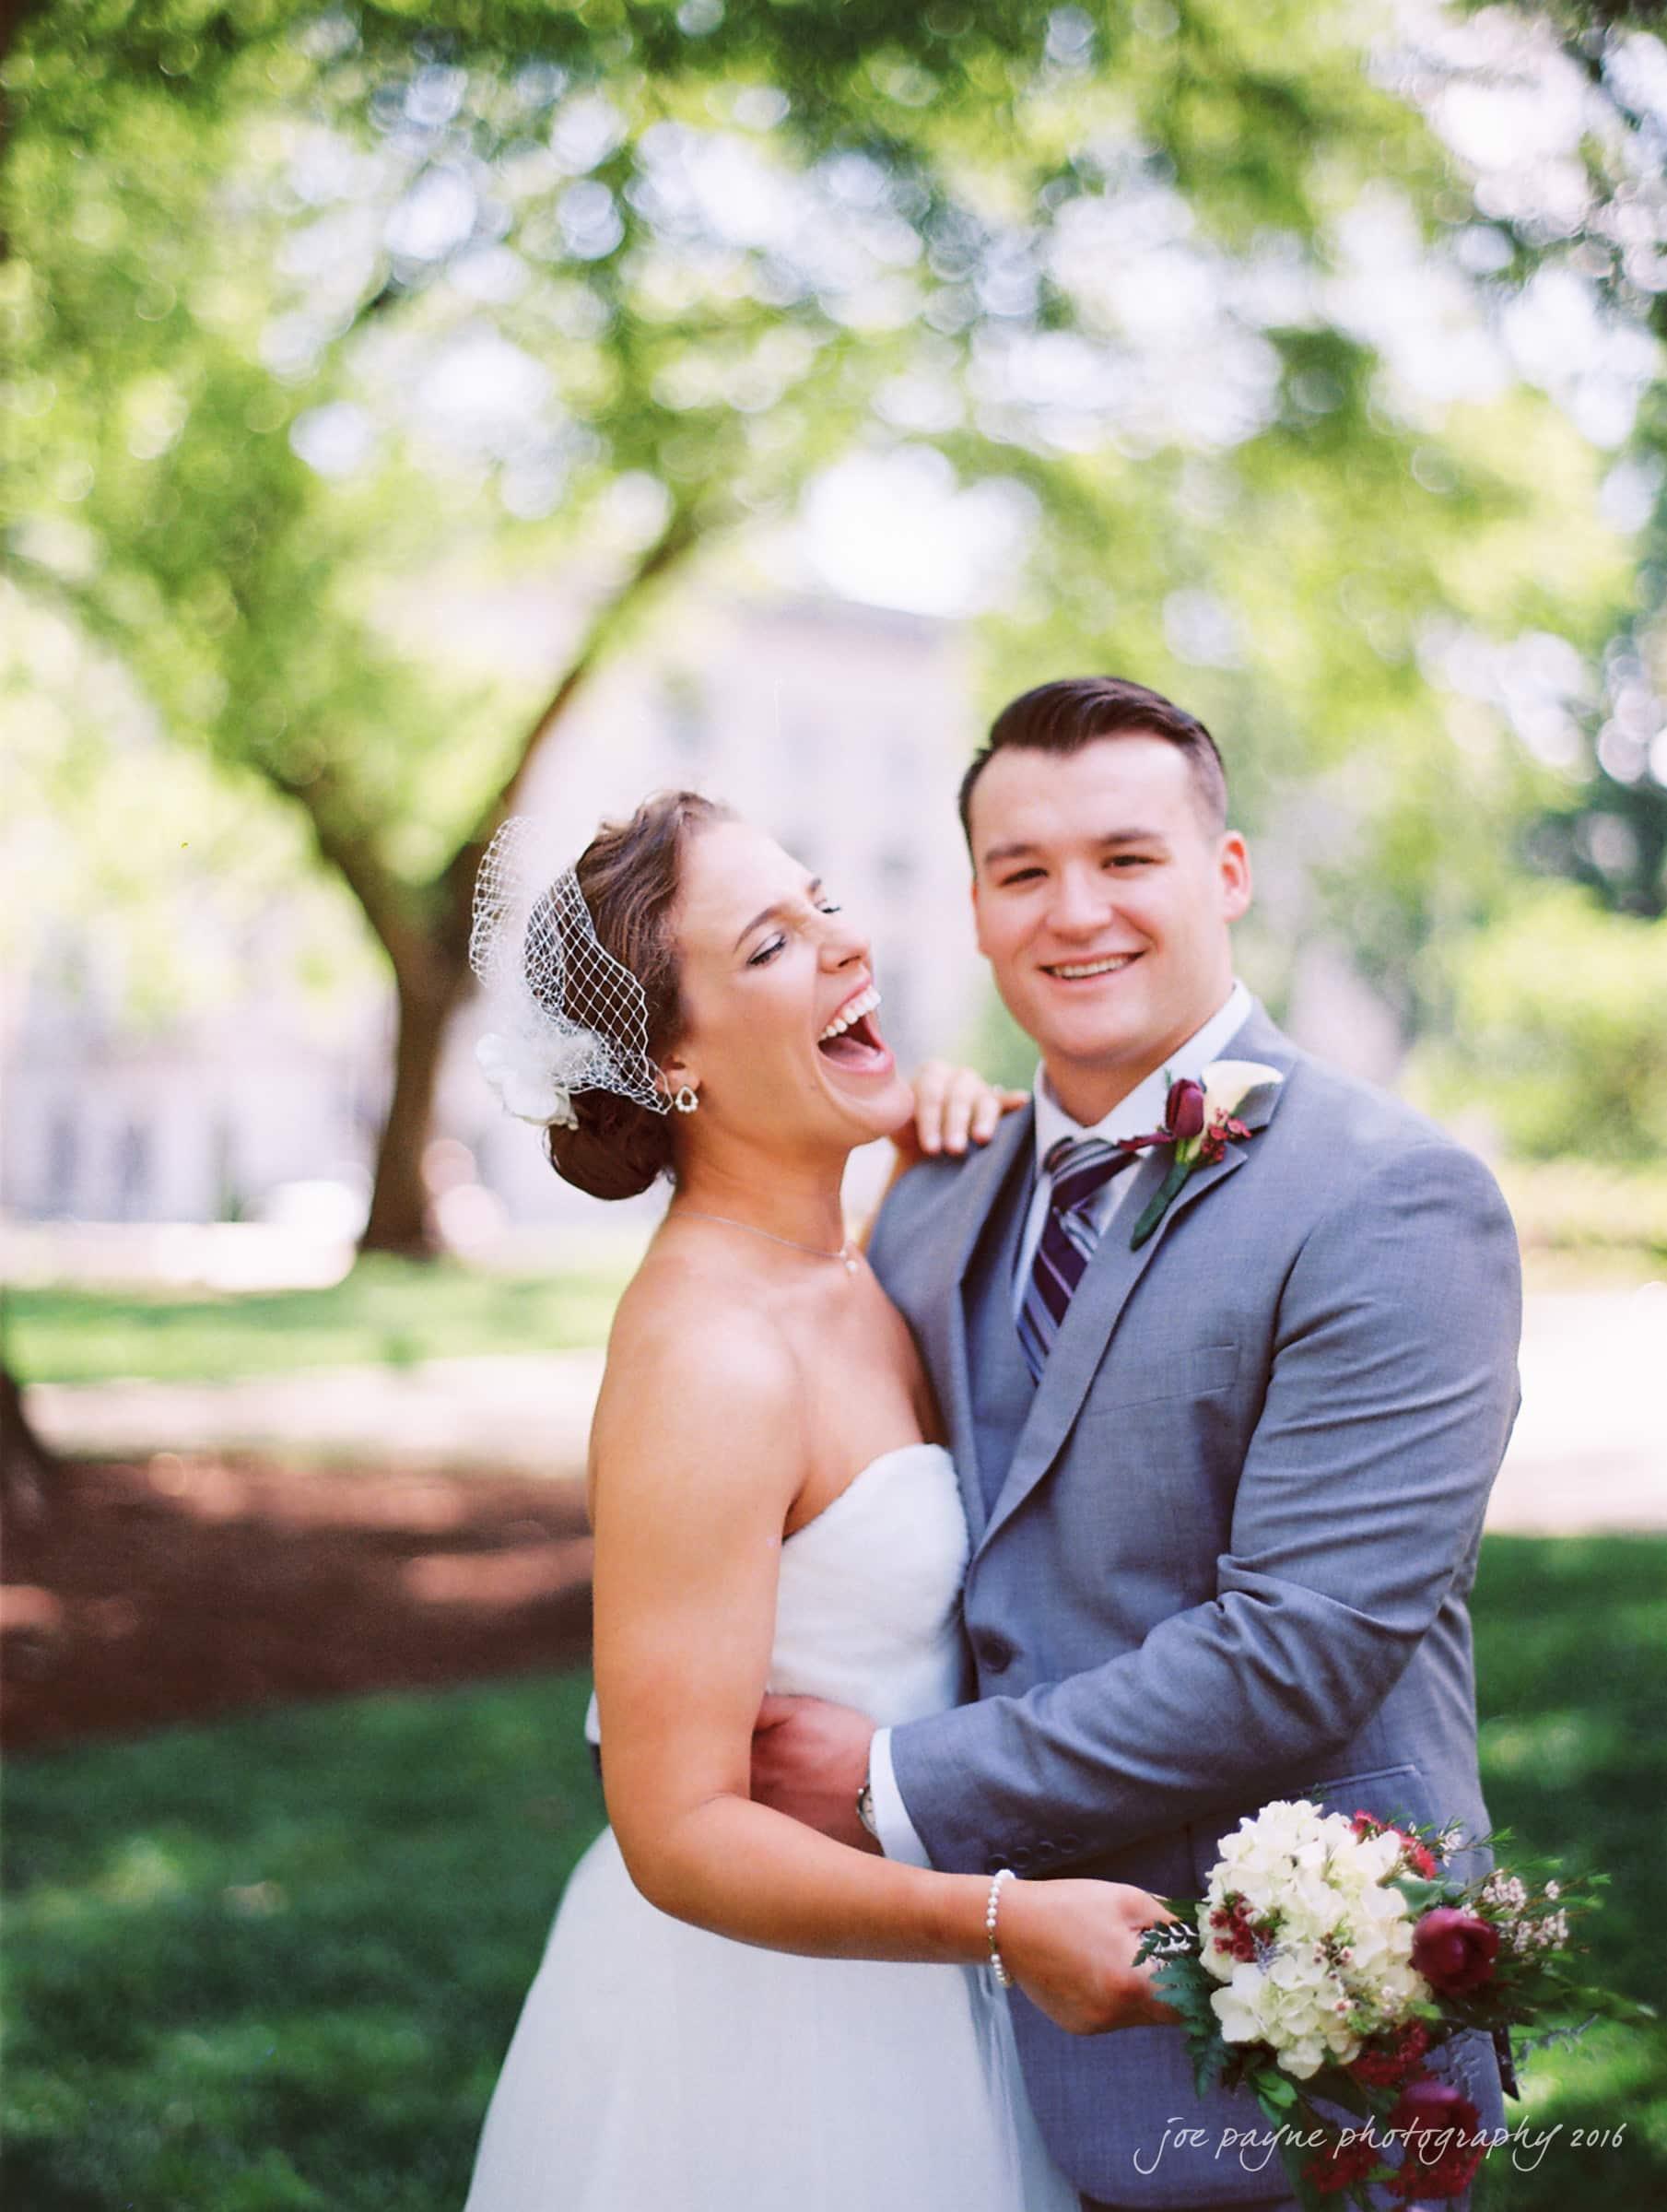 Downtown Raleigh Wedding Photographer - Alexandra & Trent -18